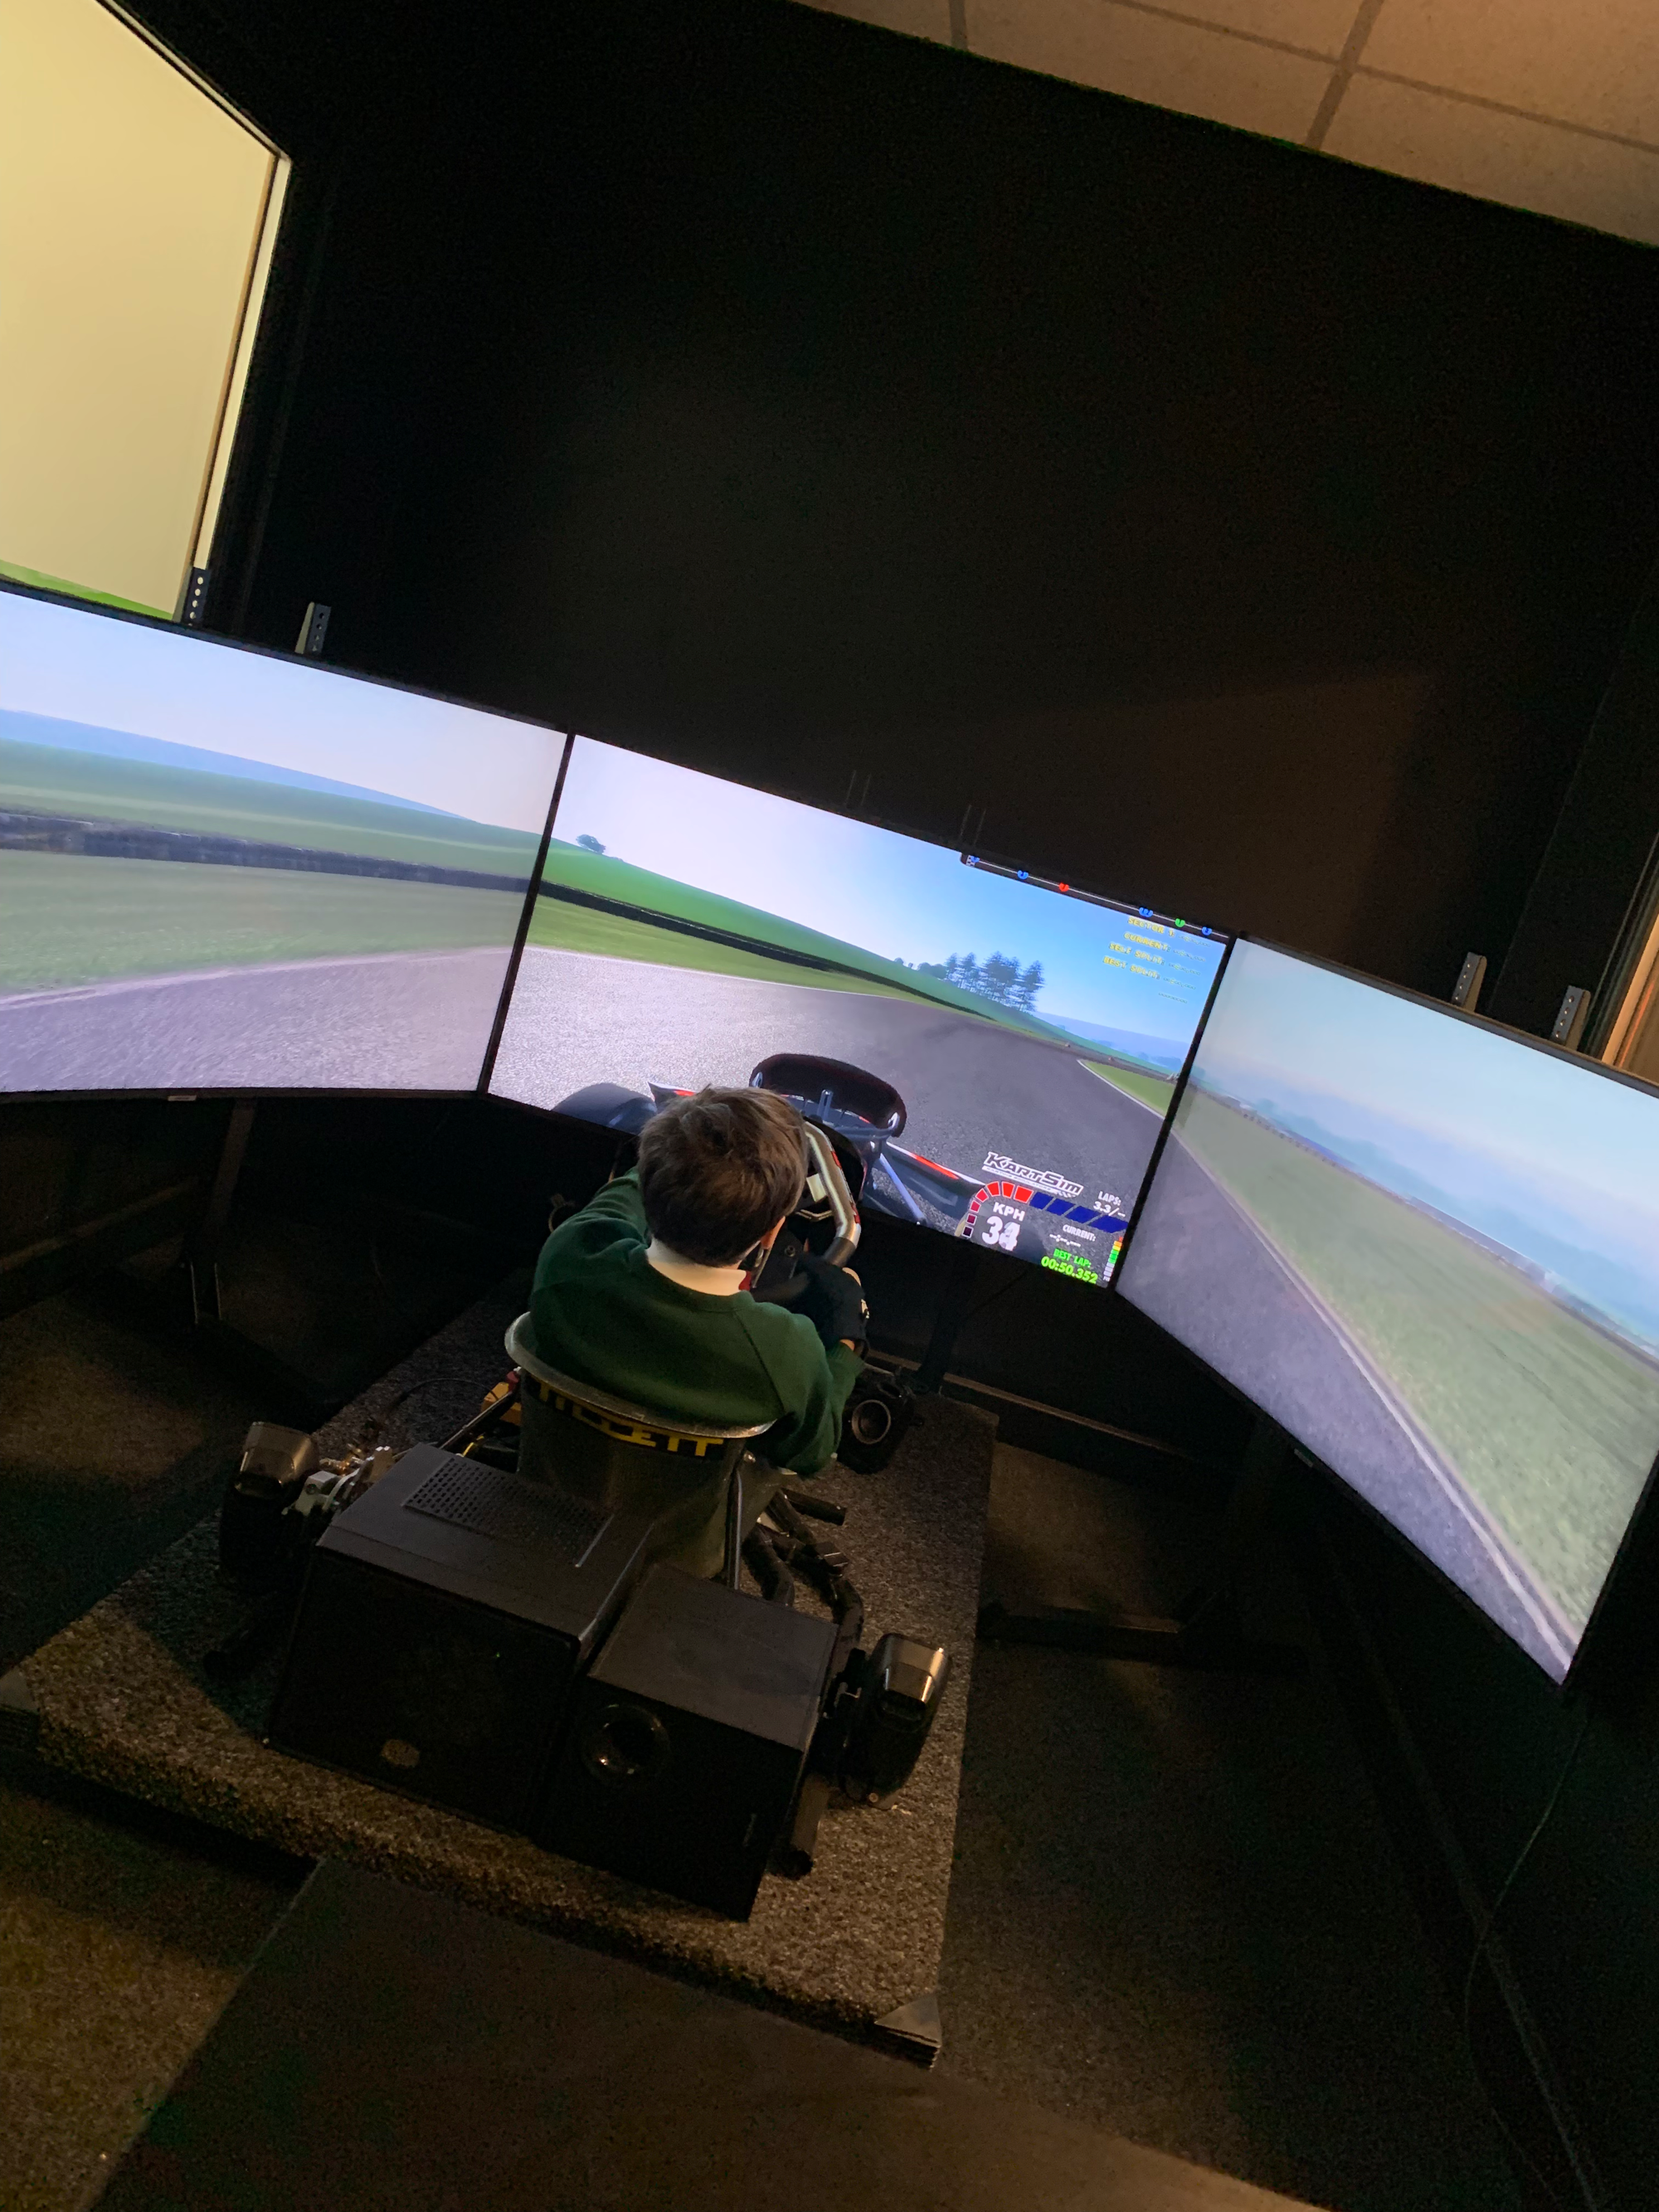 Karting simulation training